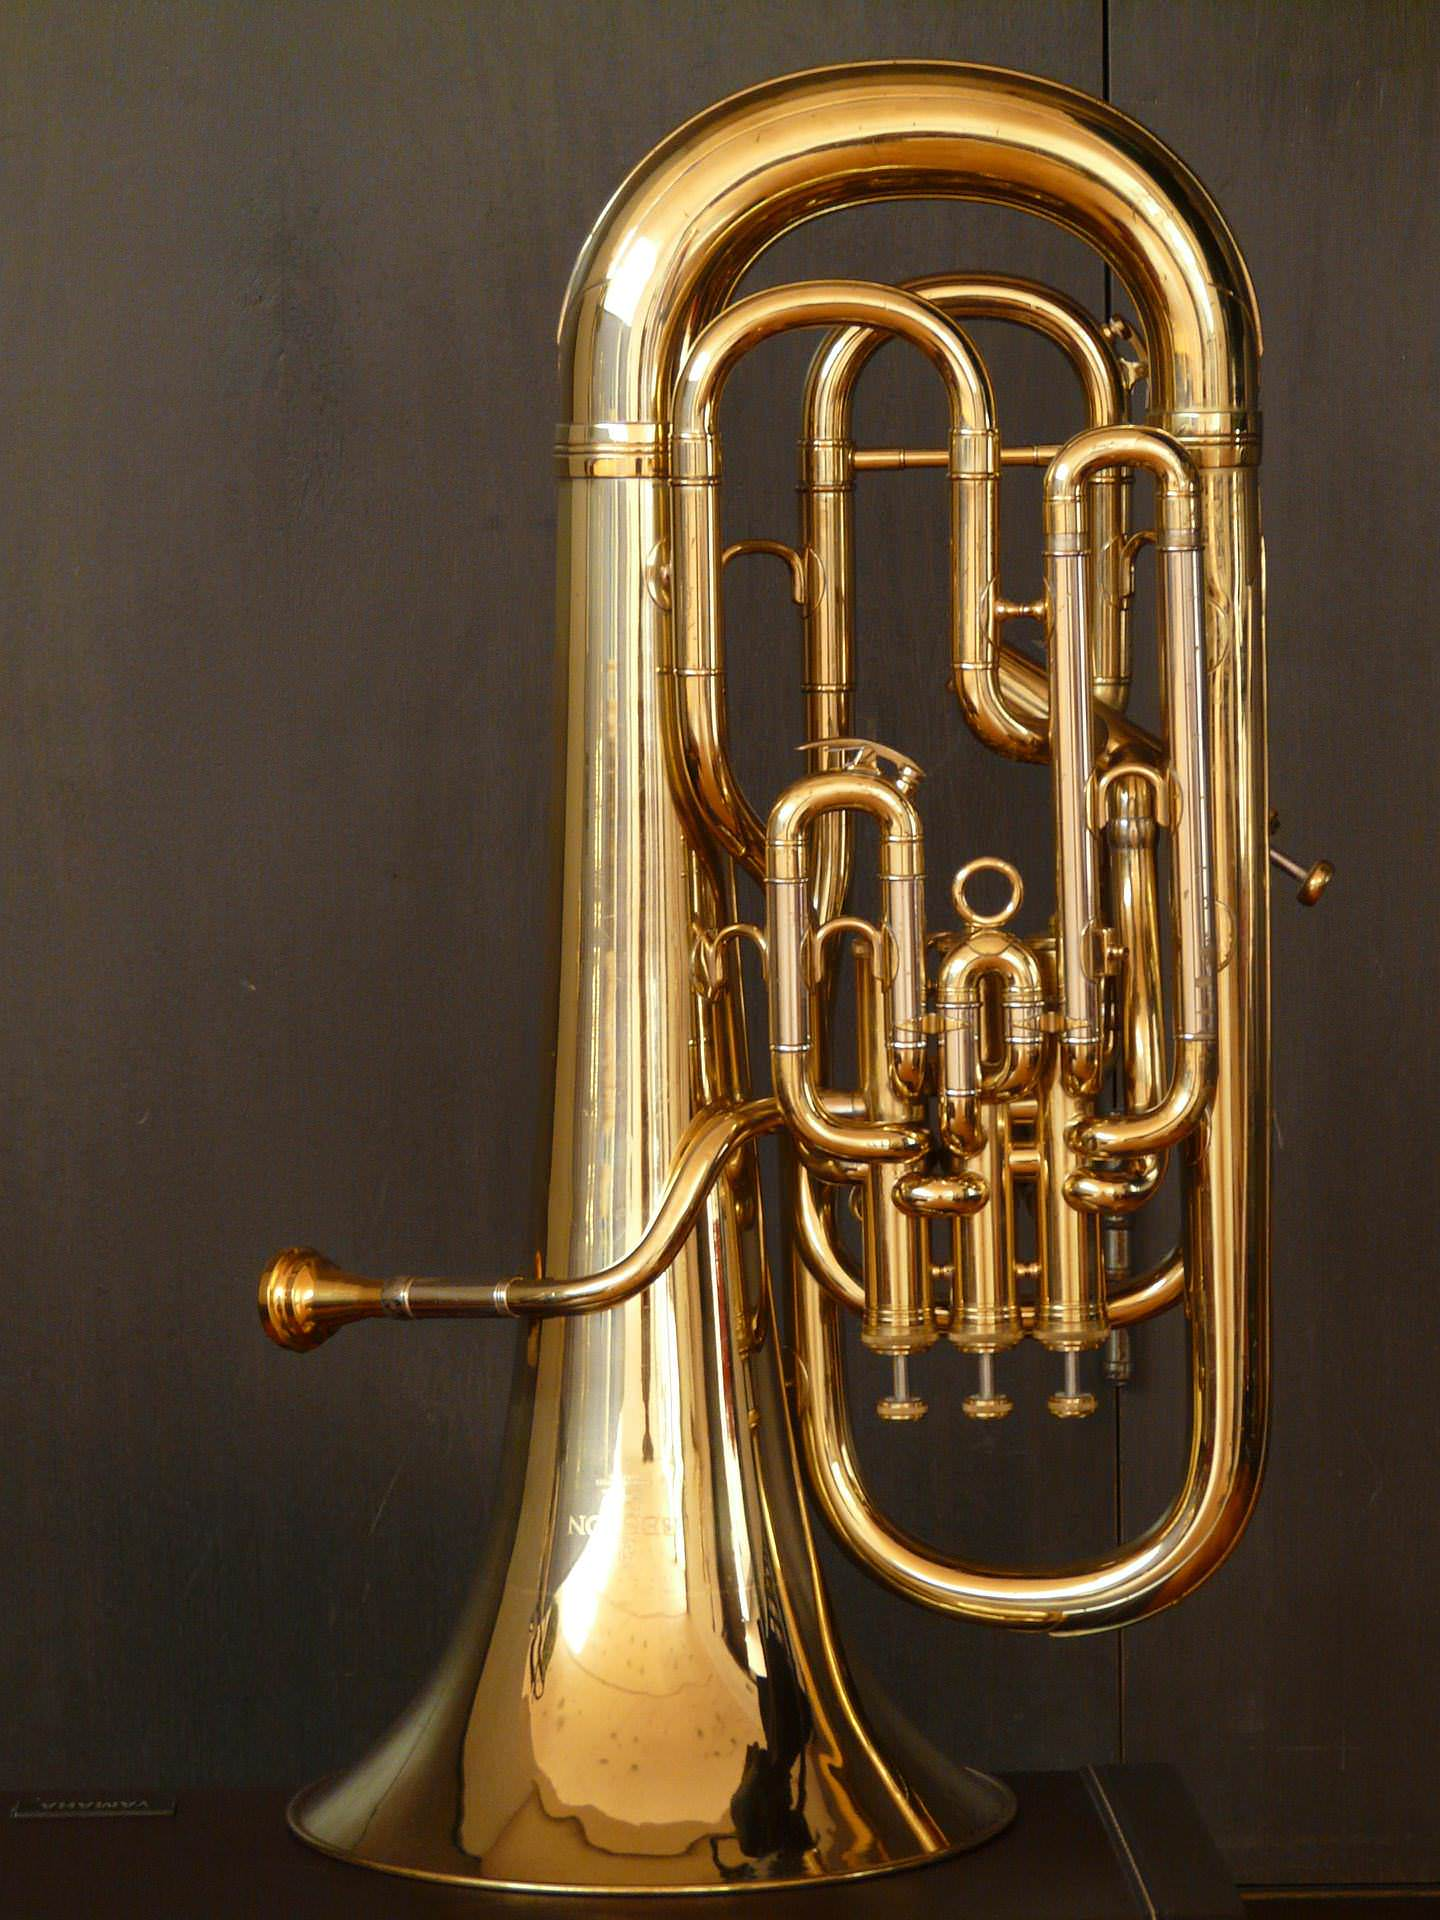 Tenorhorn, Bariton, Euphonium lernen: Tenorhorn-, Bariton-, Euphonium-Unterricht an der JMS